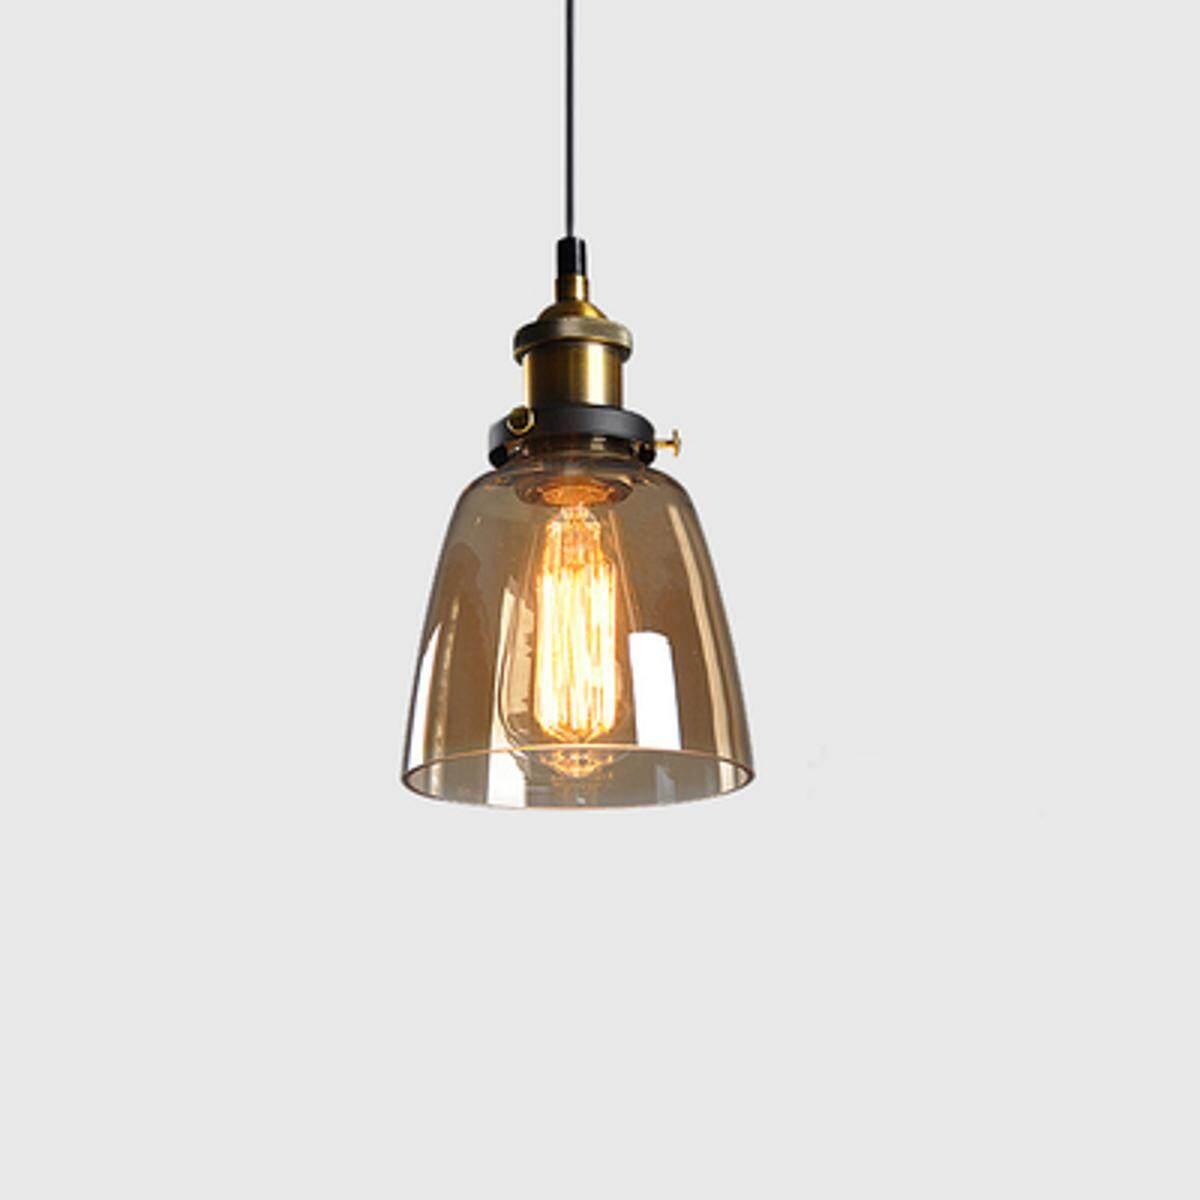 Modern Vintage Industrial Retro Loft Glass Ceiling Lamp Shade Pendant Light